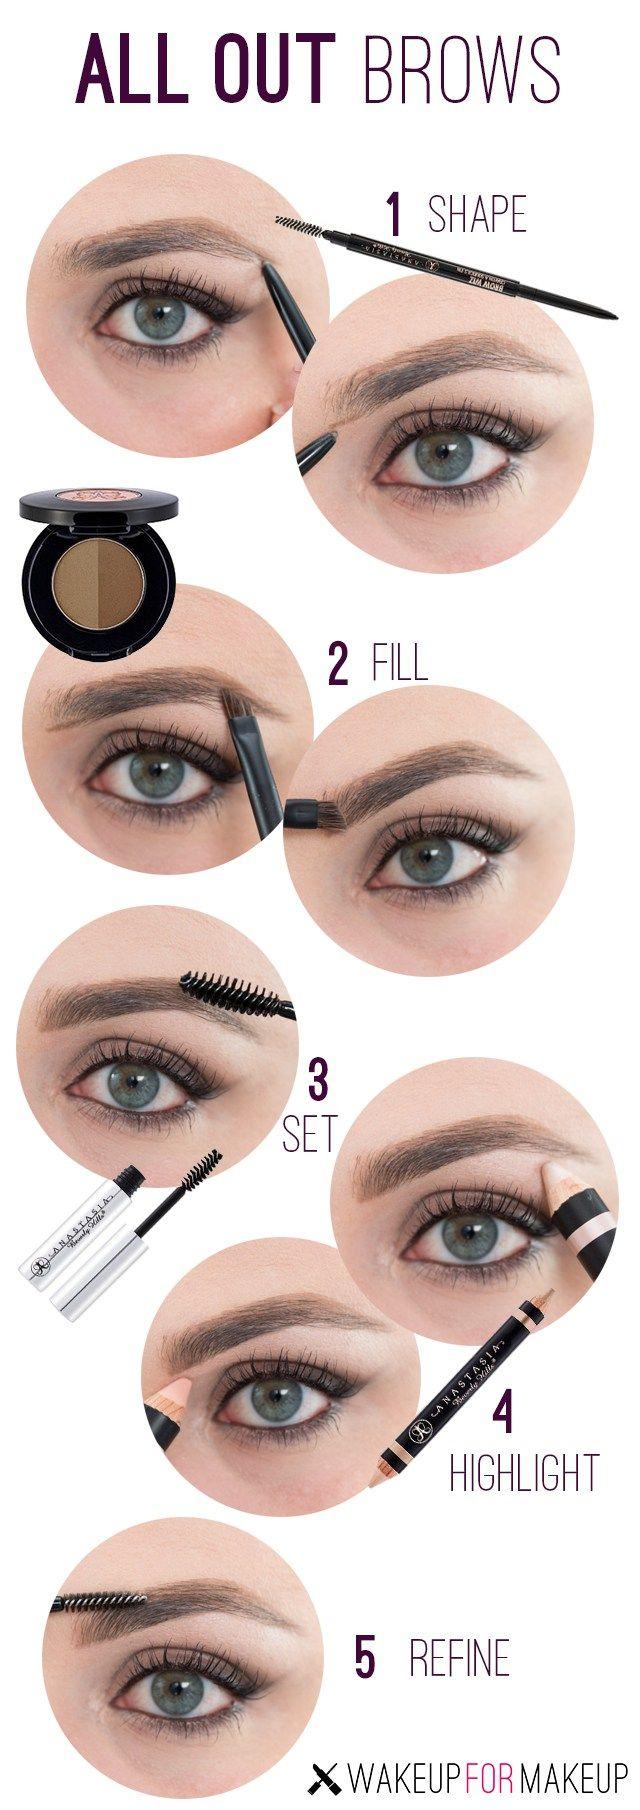 Best 25+ Anastasia eyebrow pencil ideas on Pinterest | Eyebrow ...